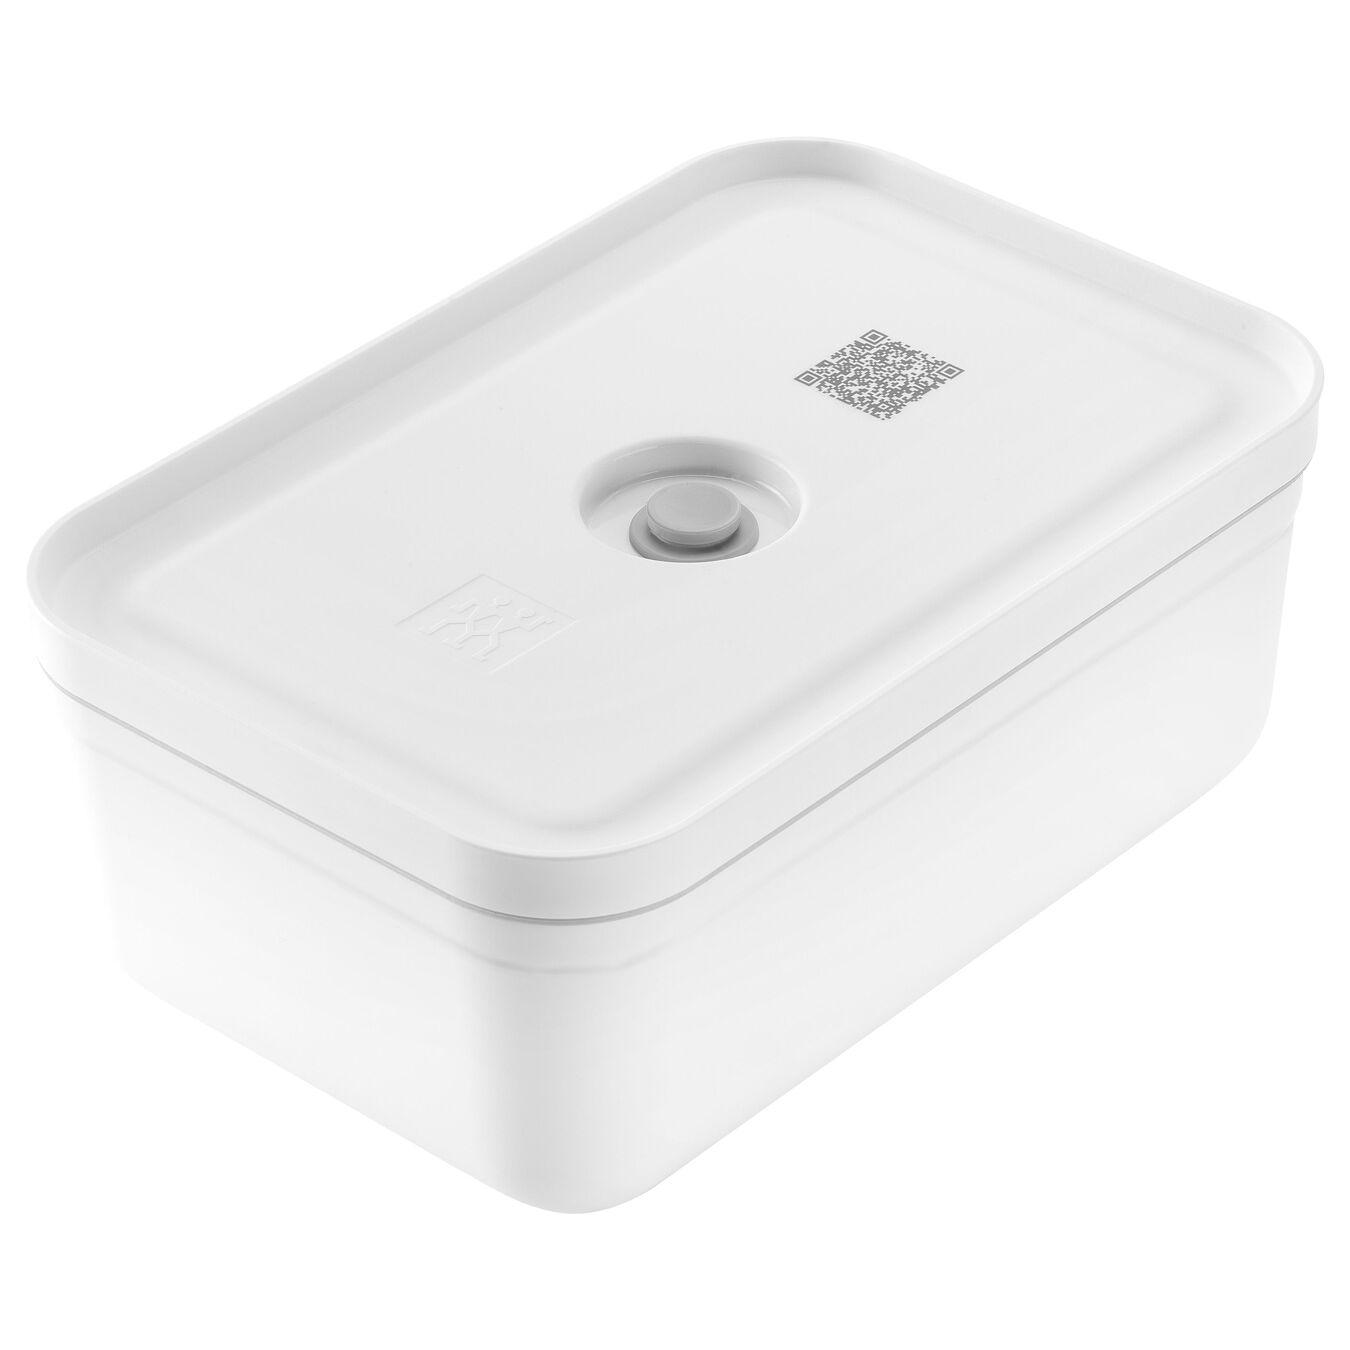 large Vacuum lunch box, Plastic, white,,large 1